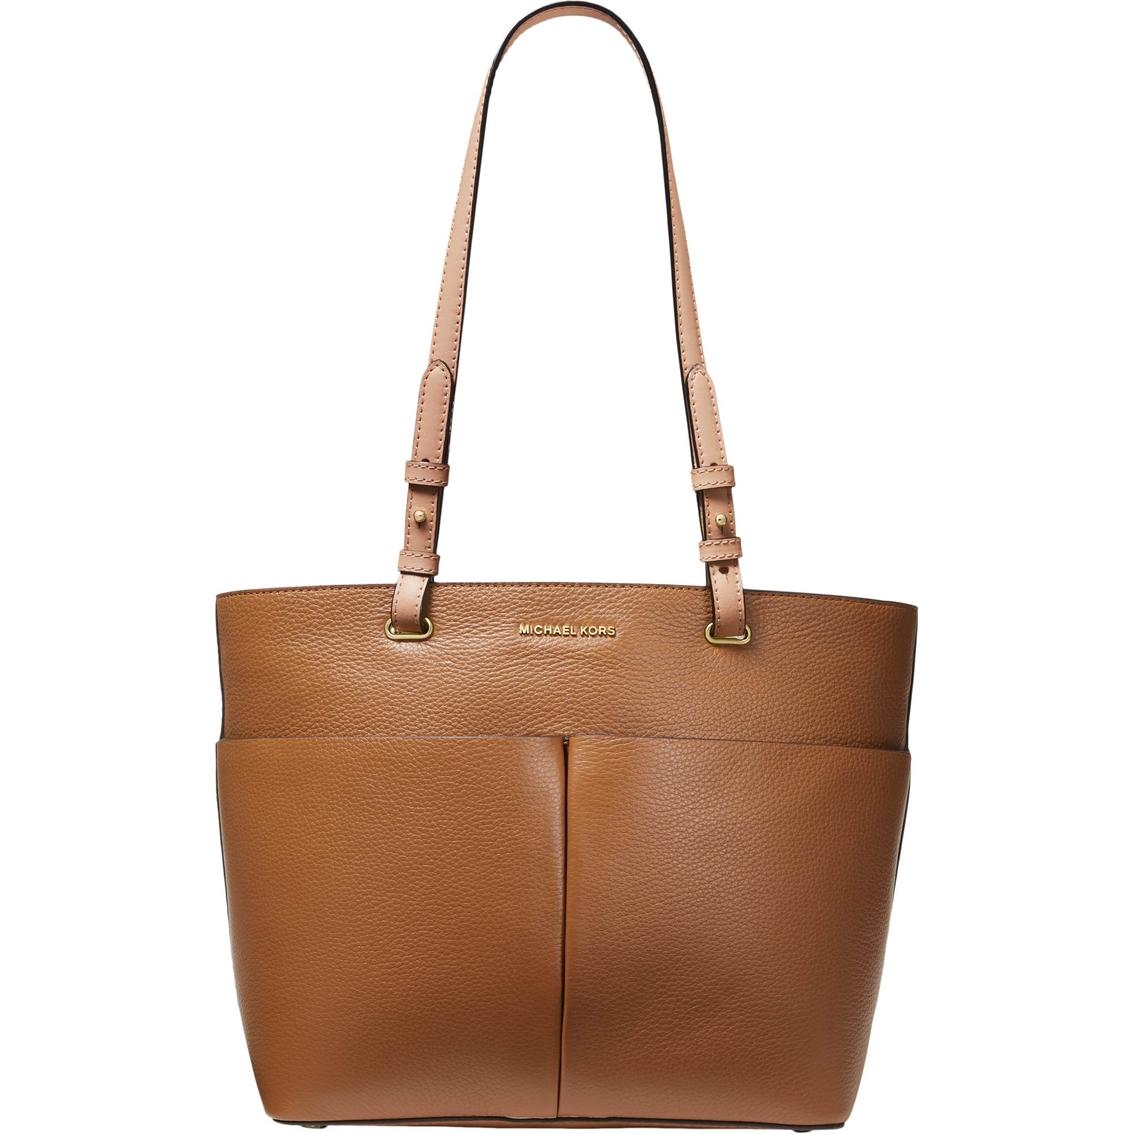 b3619335dfe5 Michael Kors Bedford Medium Tote Bag | Totes & Shoppers | Handbags ...